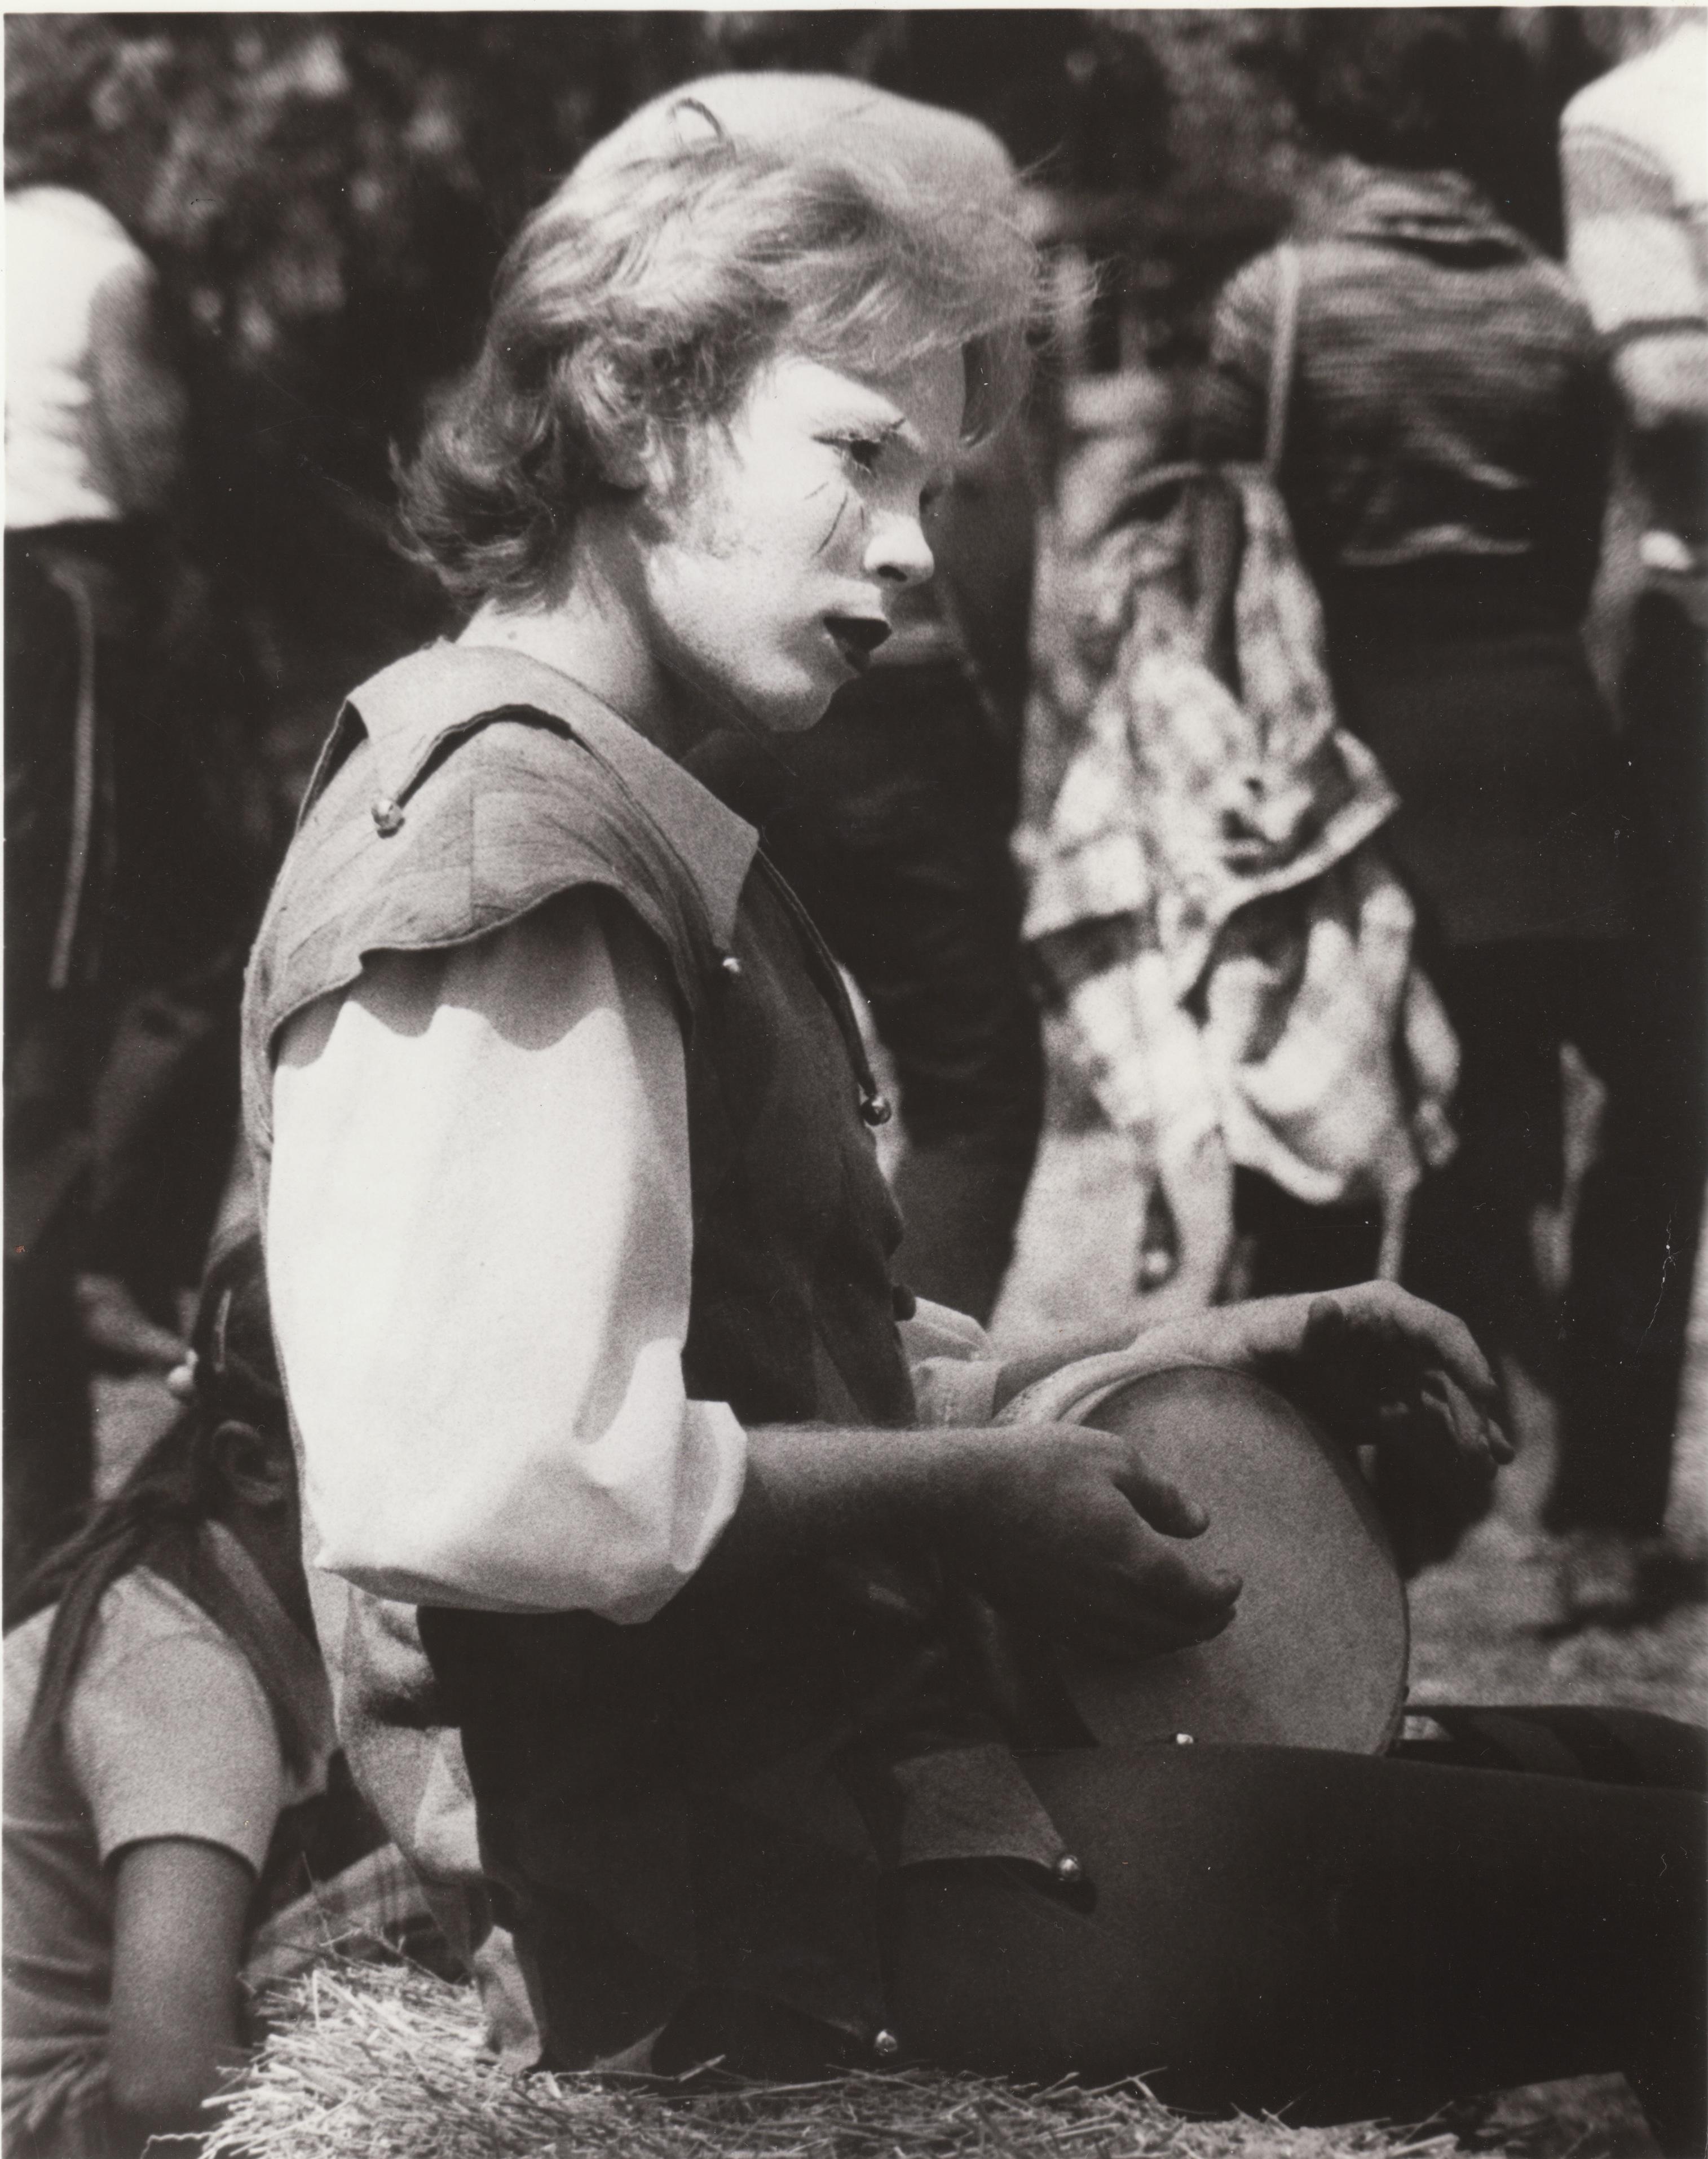 Lloyd Playing Bumbek in 1977